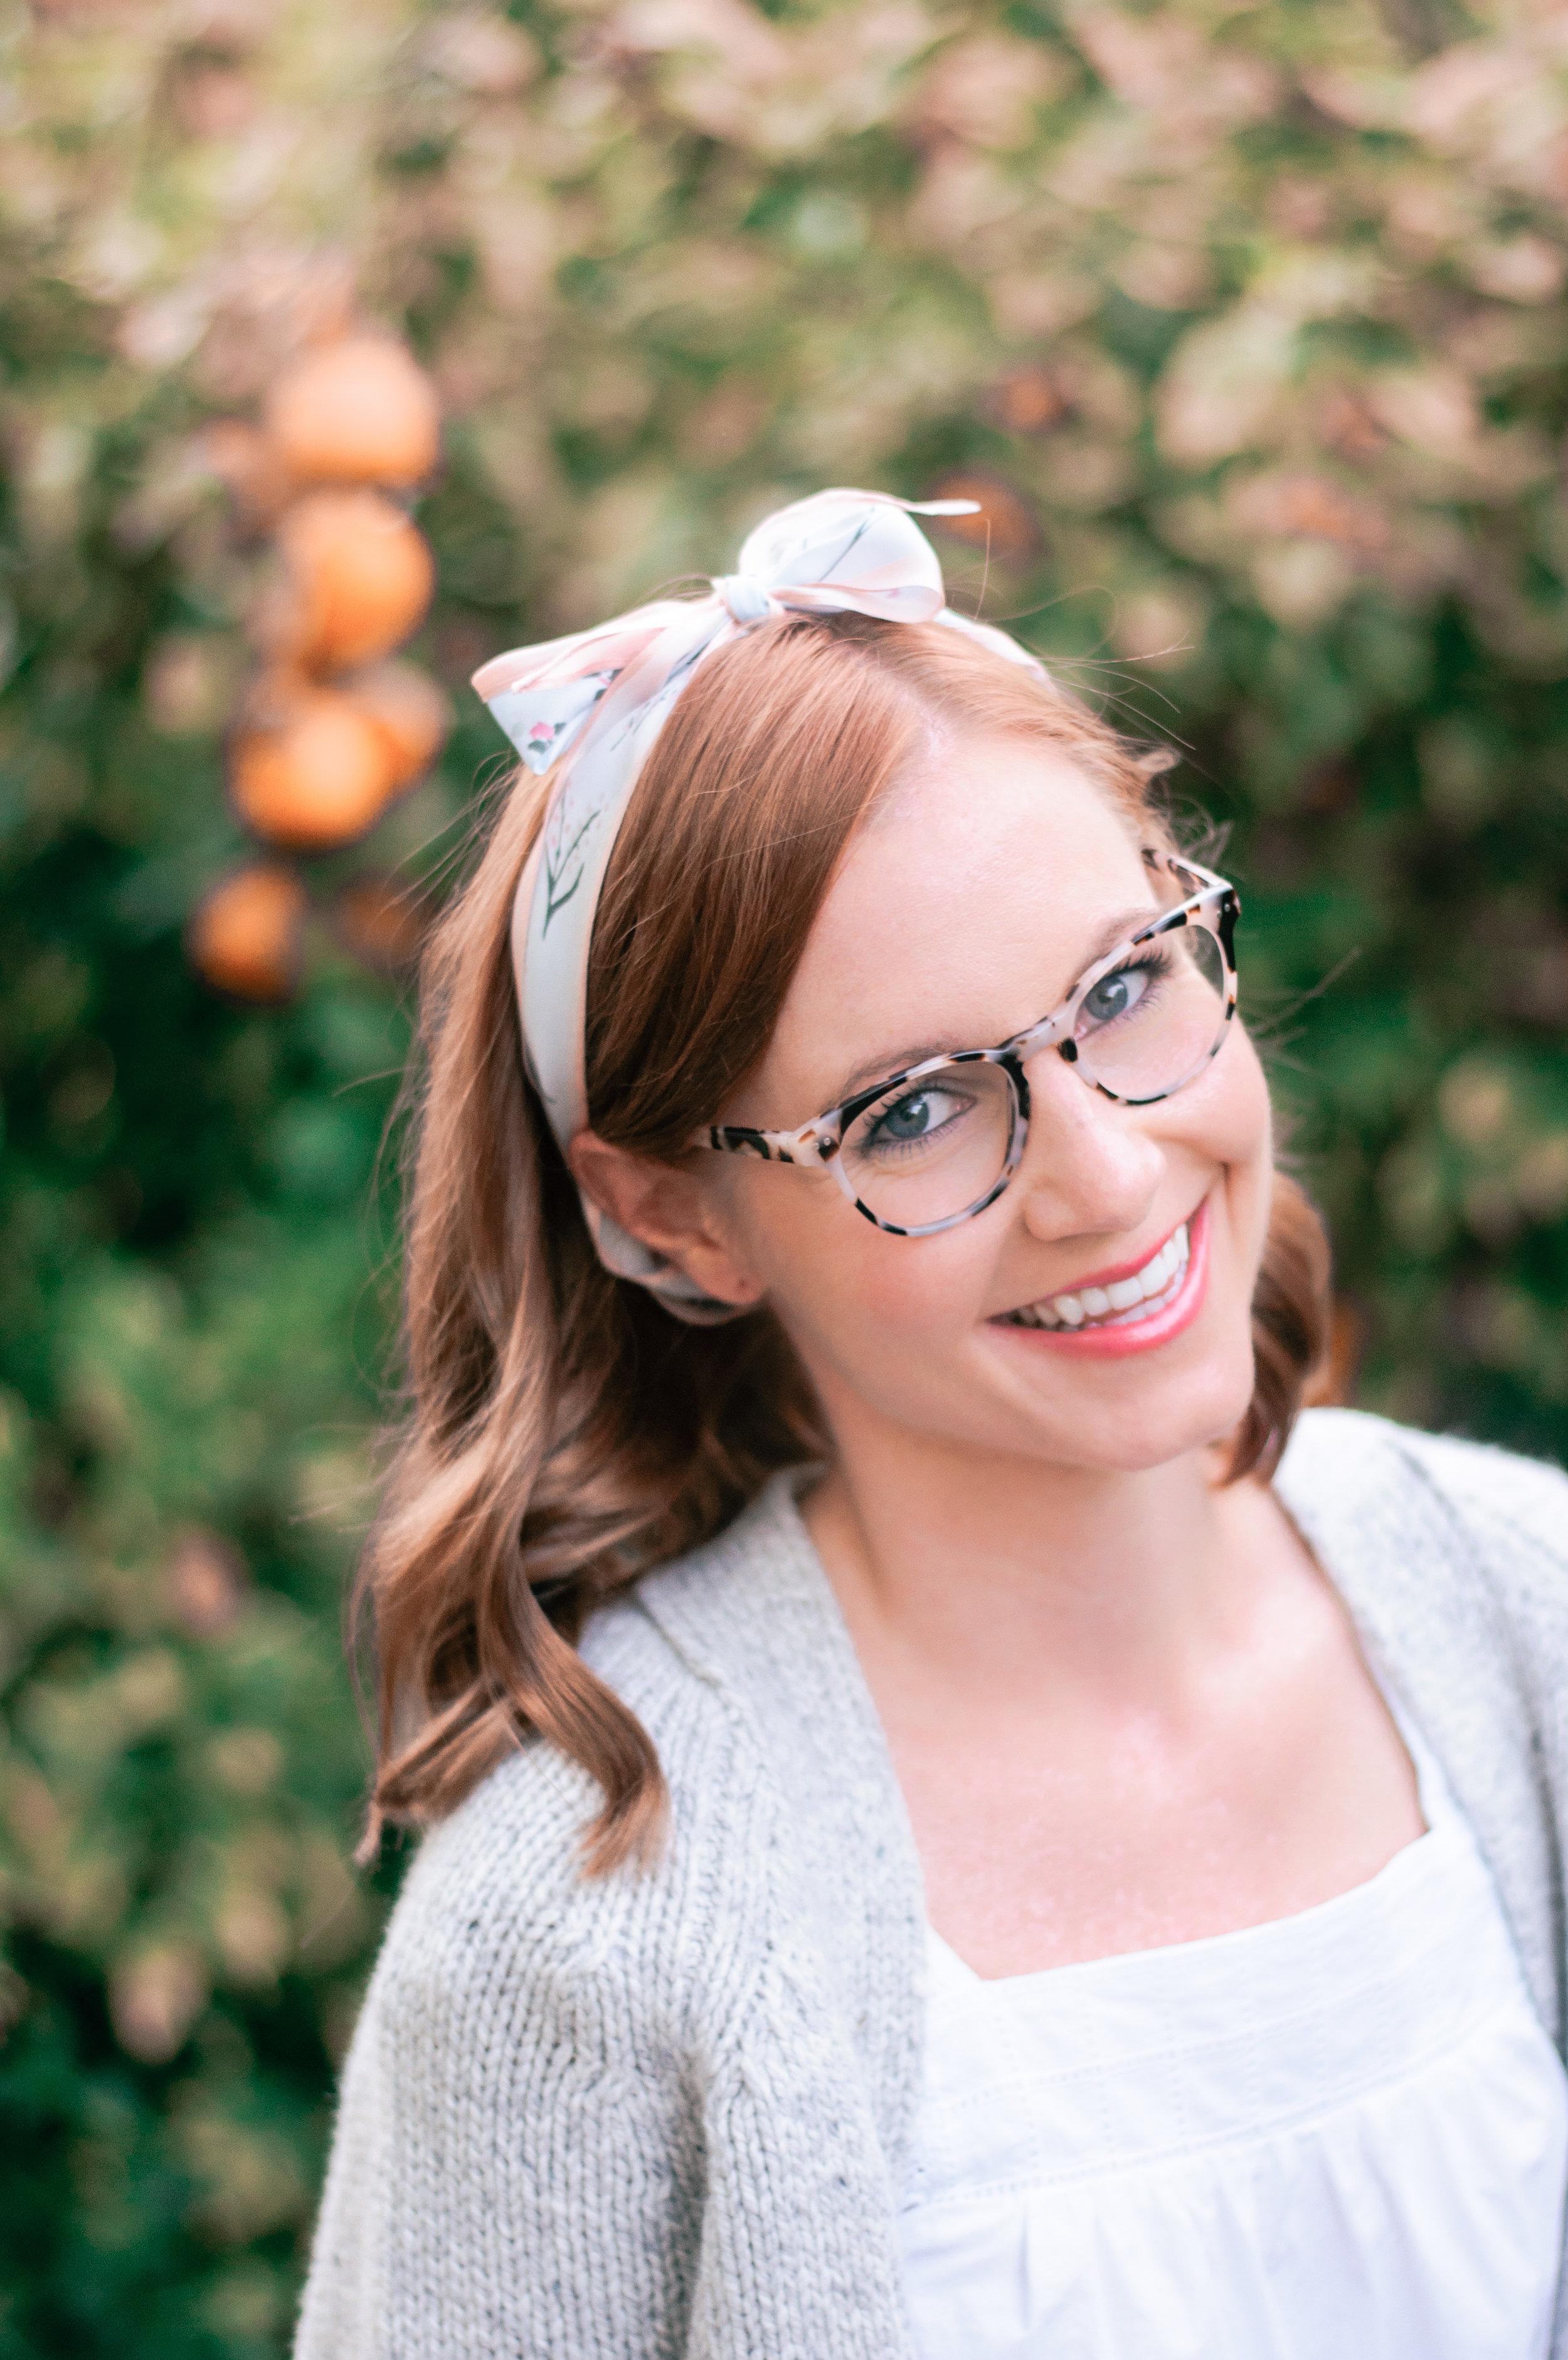 EyeBuyDirect Notting Hill Eyeglasses in Ivory Tortoise and Rebecca Minkoff Diamond-Cut Silk Scarf